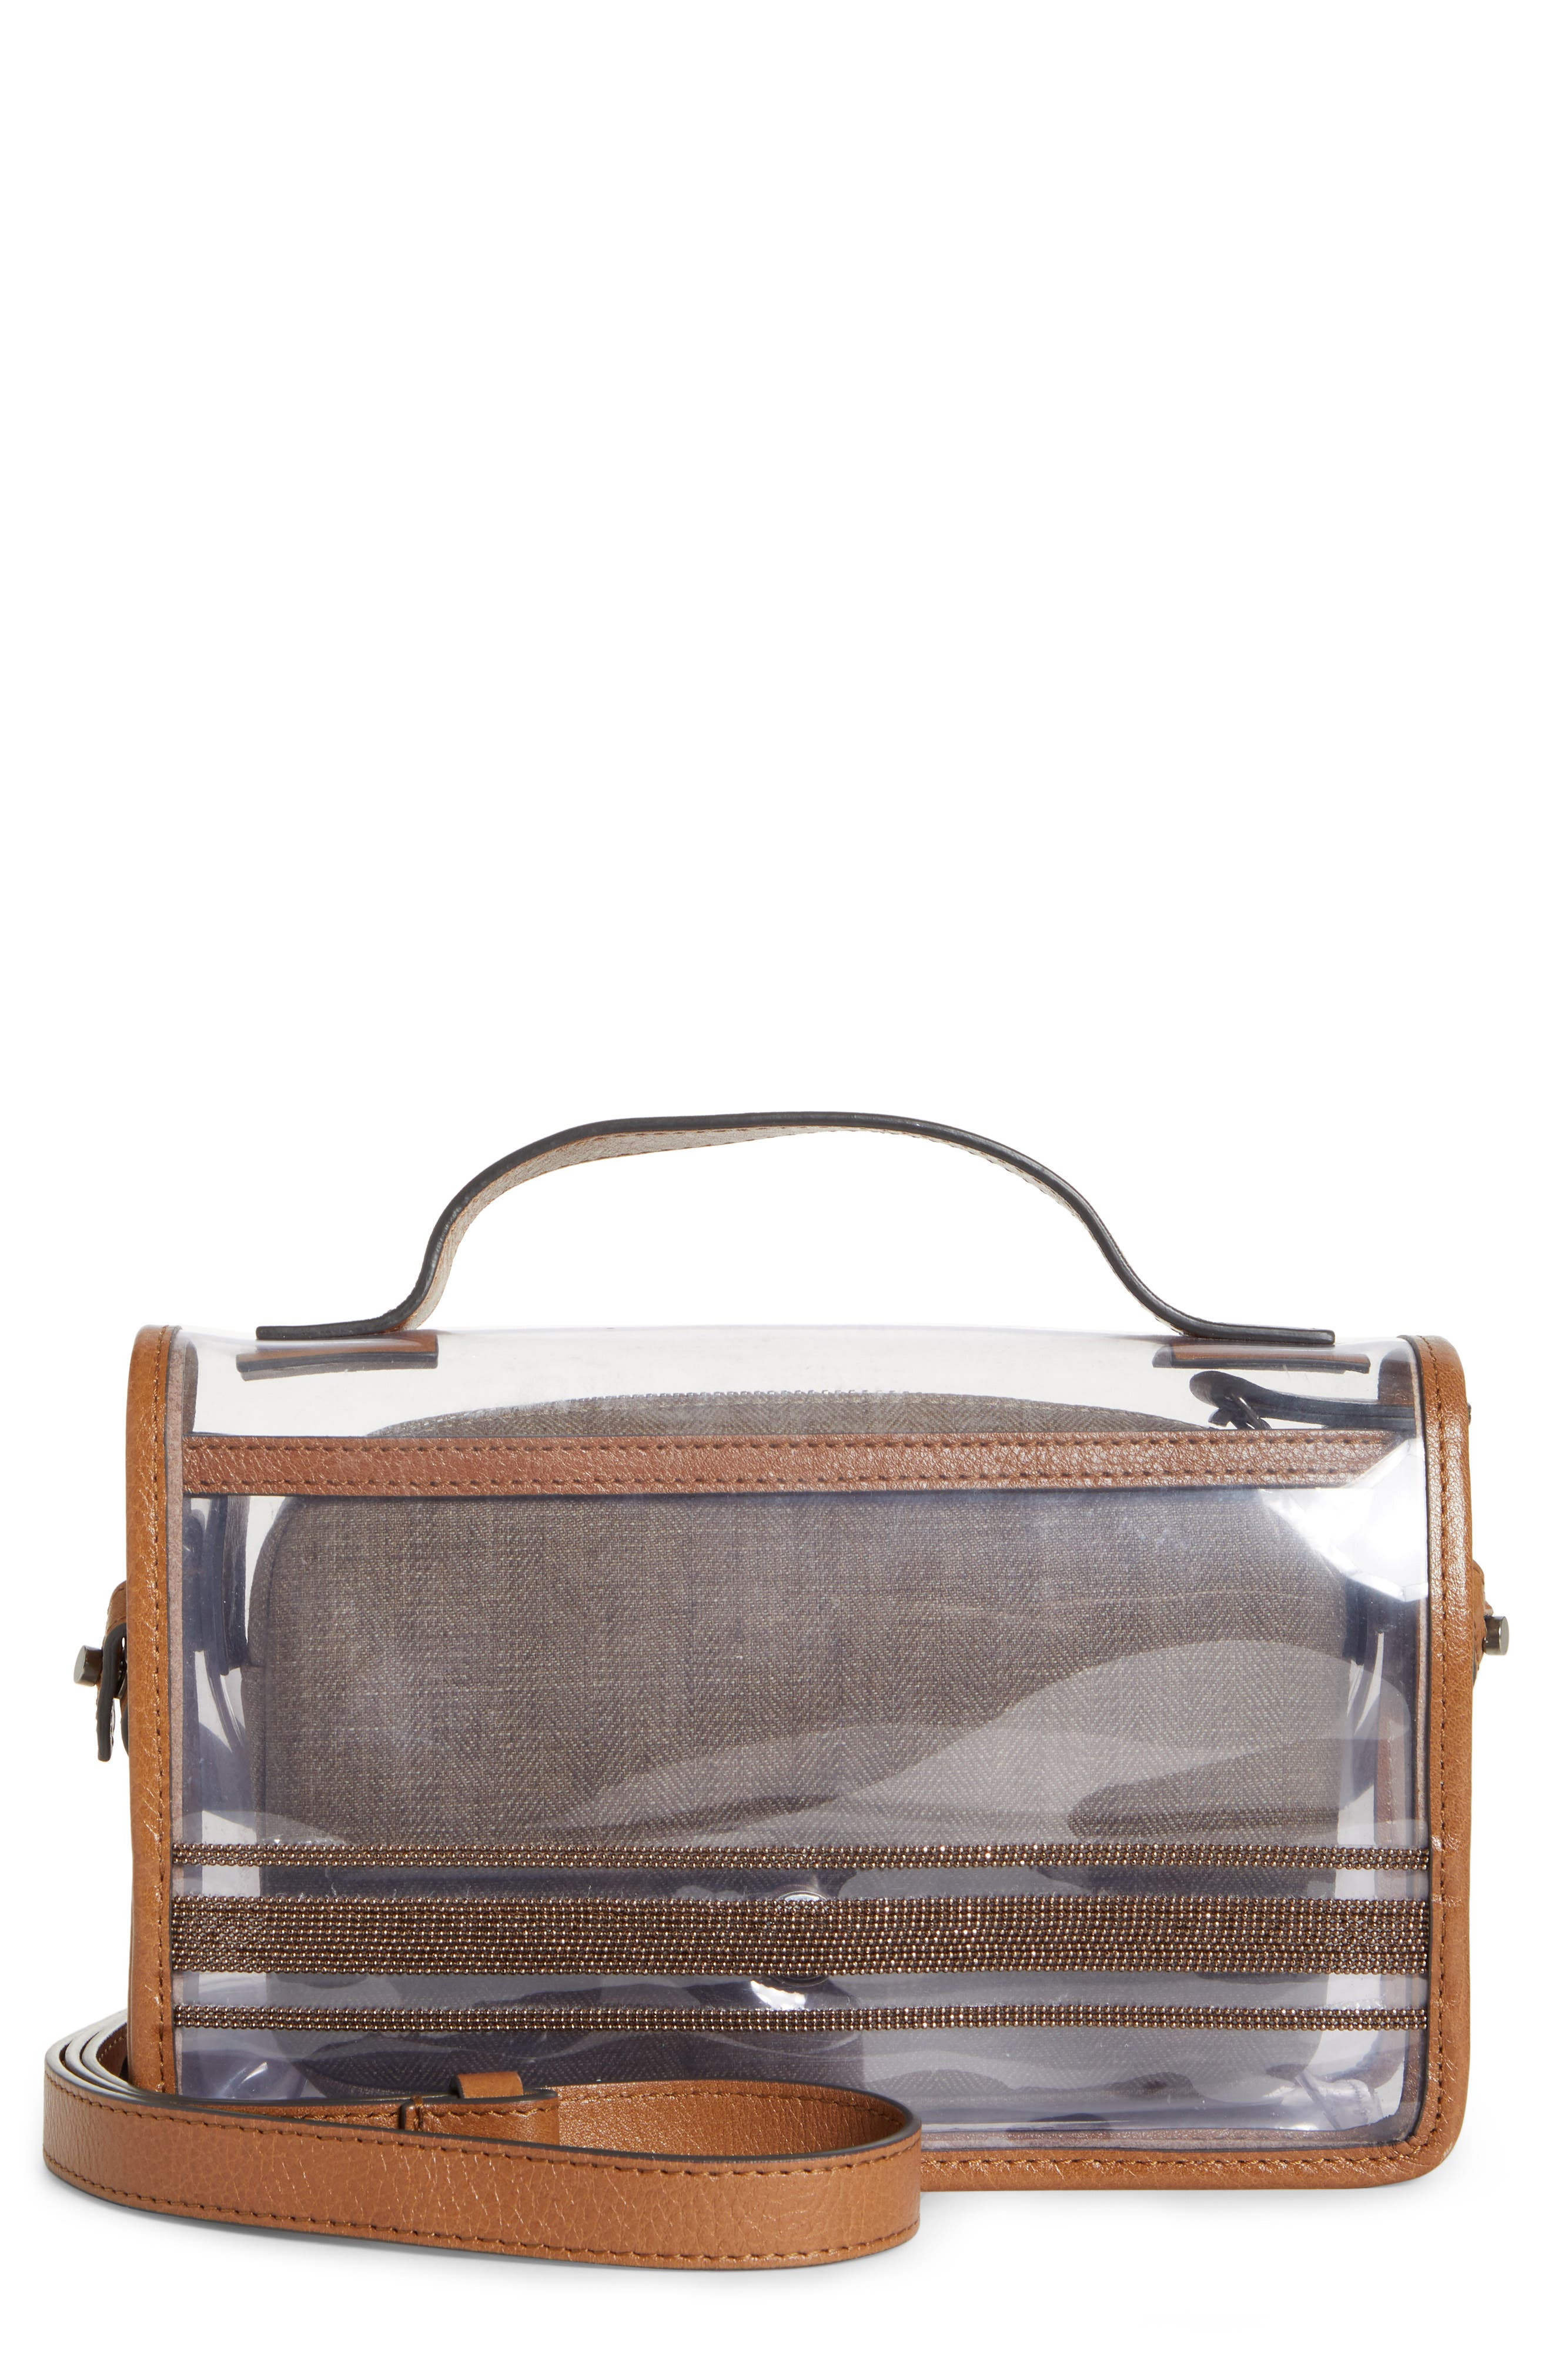 BRUNELLO CUCINELLI Monili & Leather Trim Clear Shoulder Bag, Main, color, LT BROWN